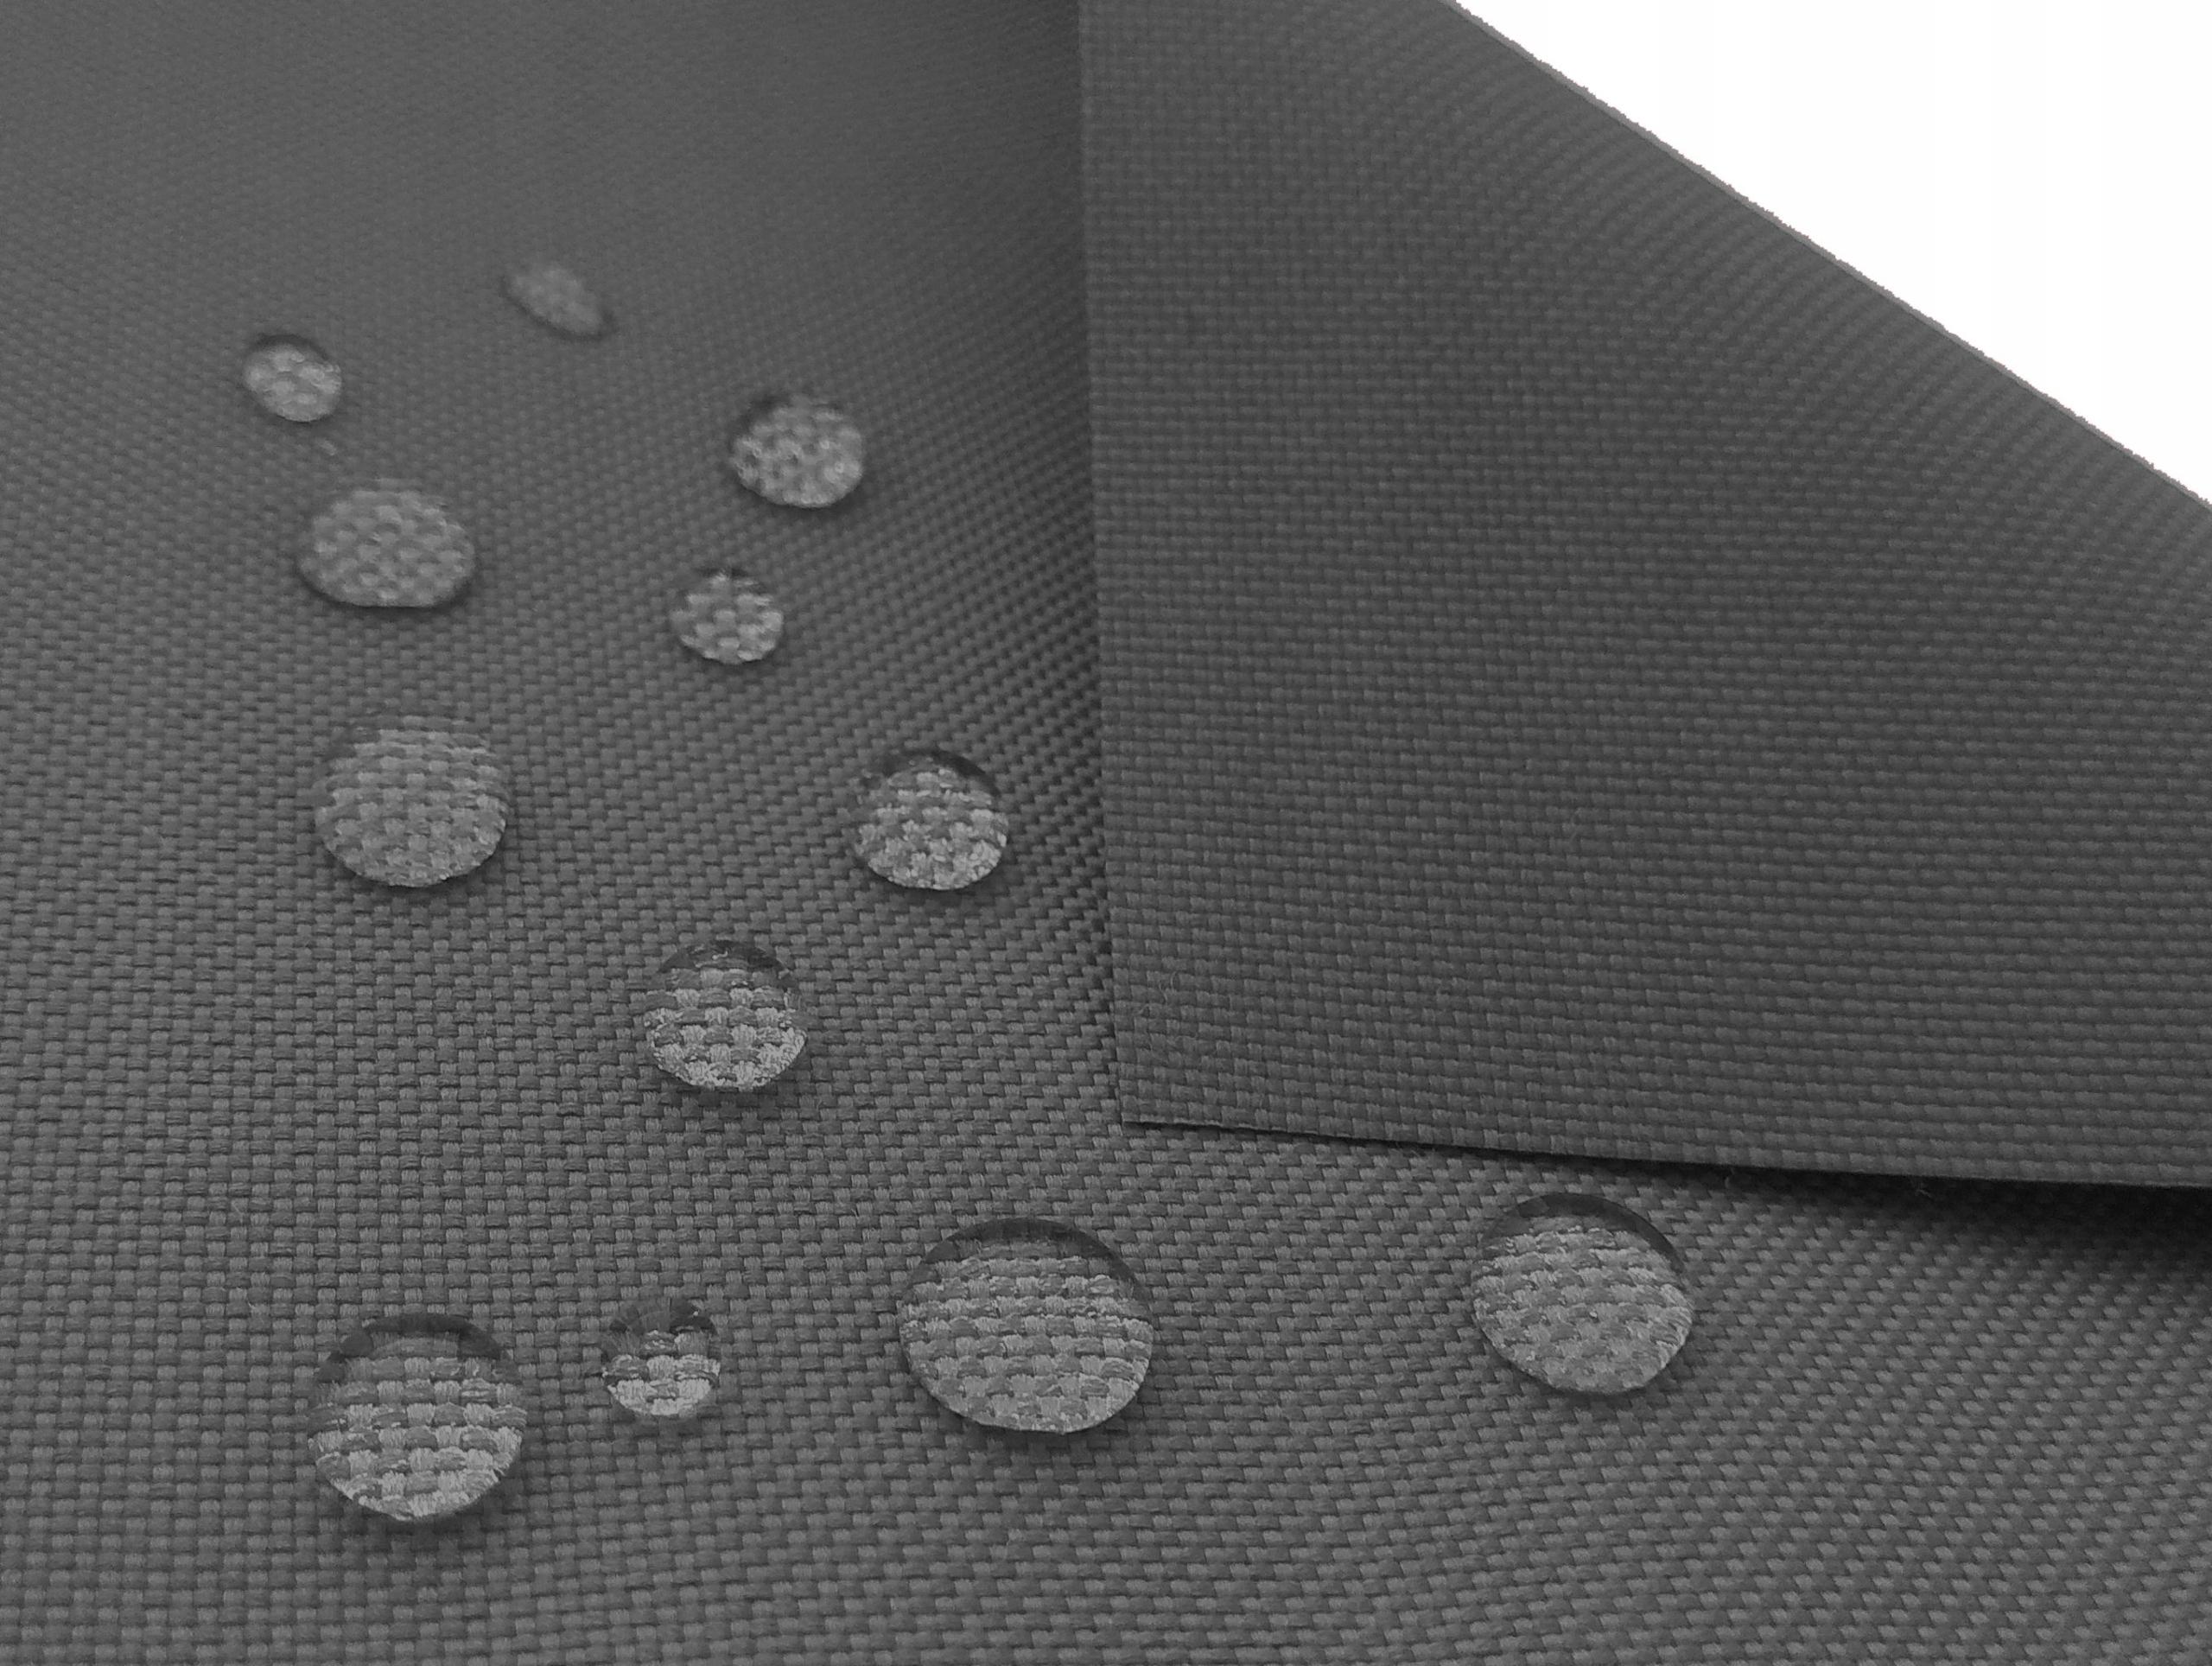 Item OXFORD cloth waterproof for garden obiciowa MAT